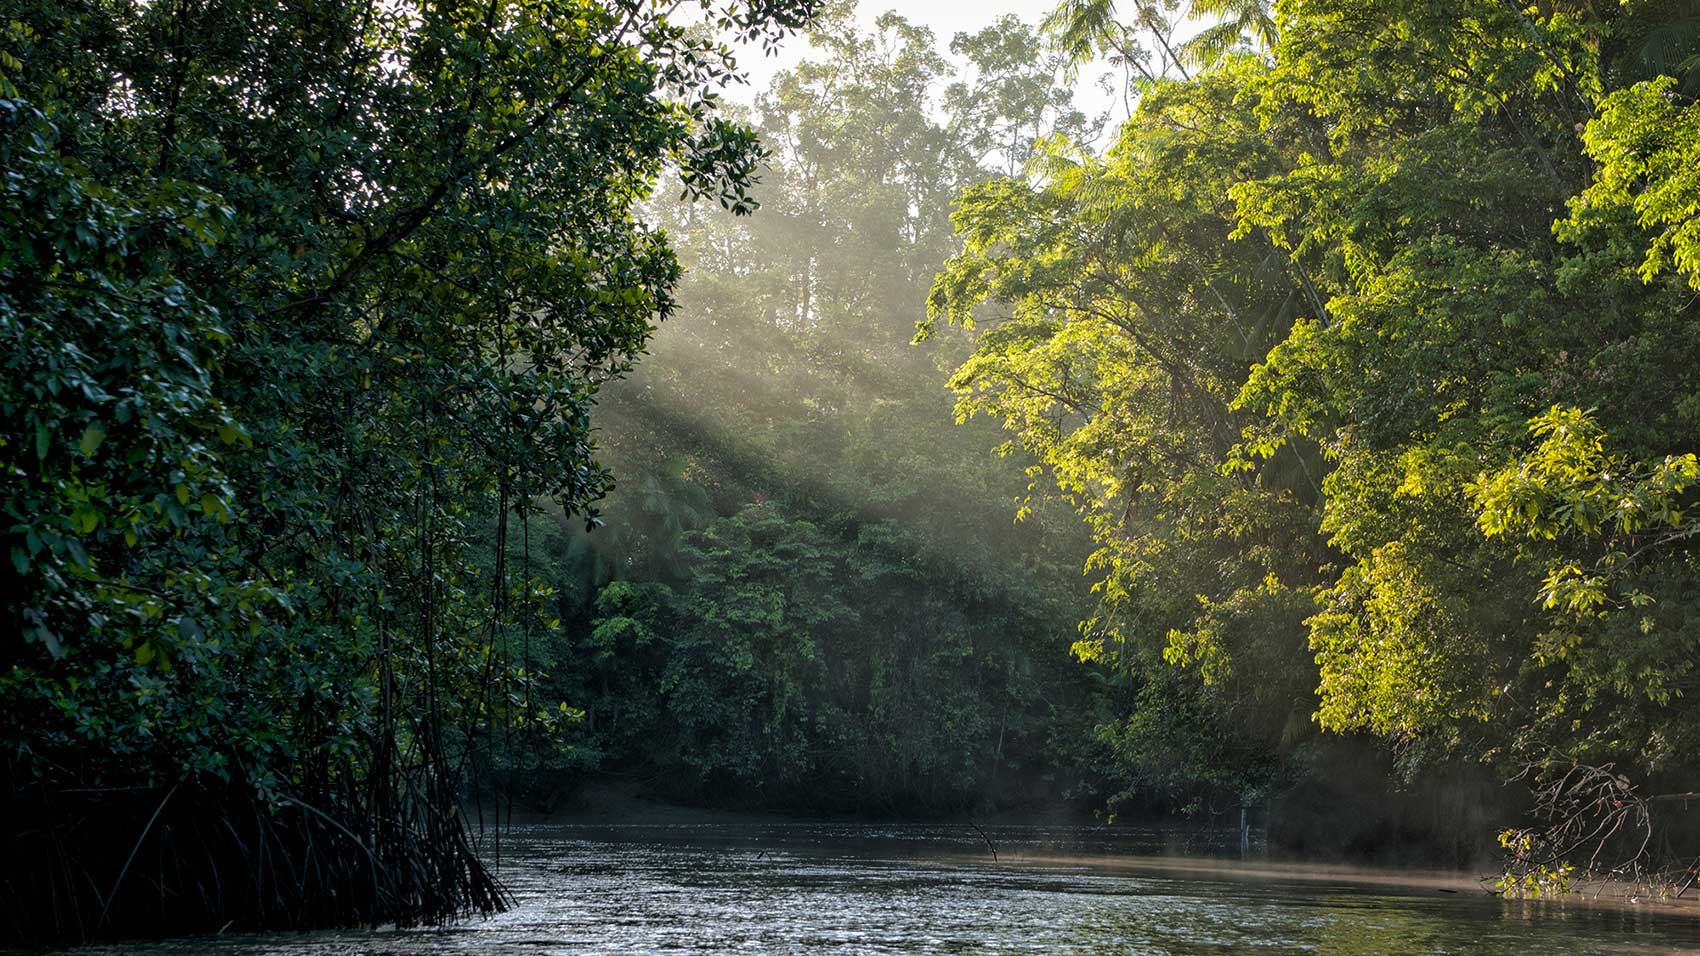 SC Johnson과 국제보존협회(Conservation International)는 보존 파트너로서 아마존의 삼림파괴를 막기 위해 노력하고 있습니다